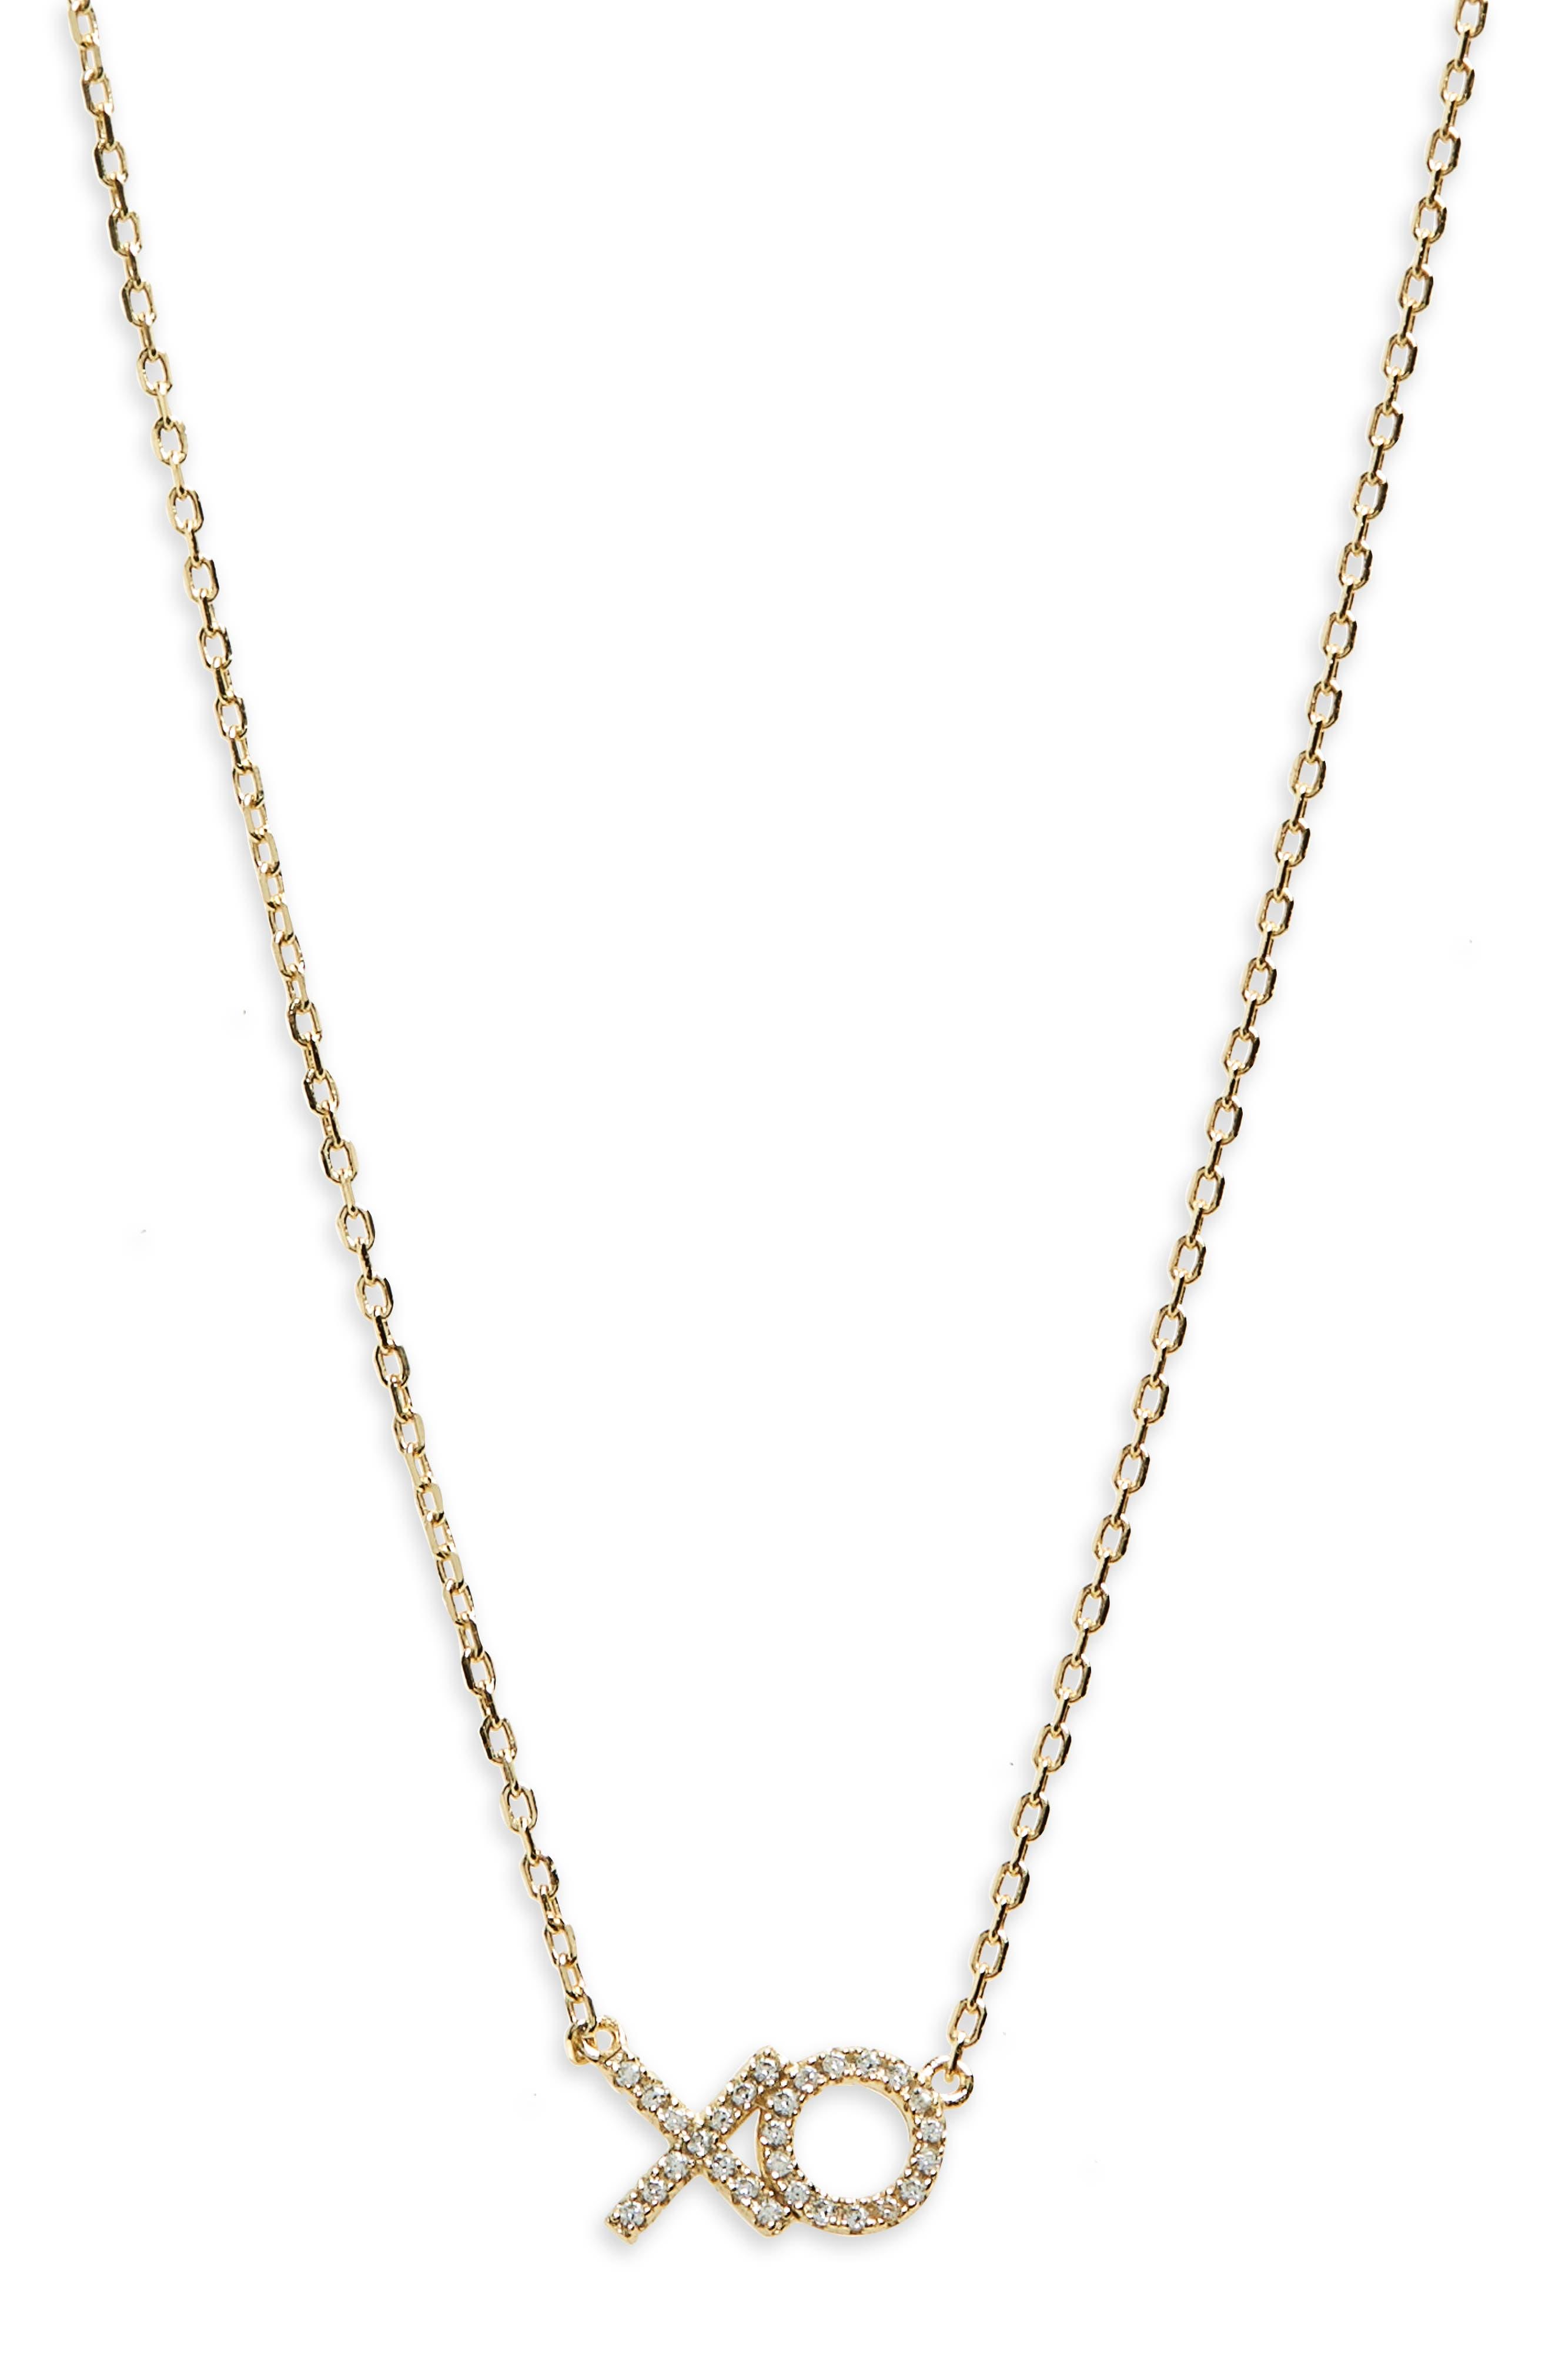 XO Pavé Pendant Necklace,                             Main thumbnail 1, color,                             Yellow Gold